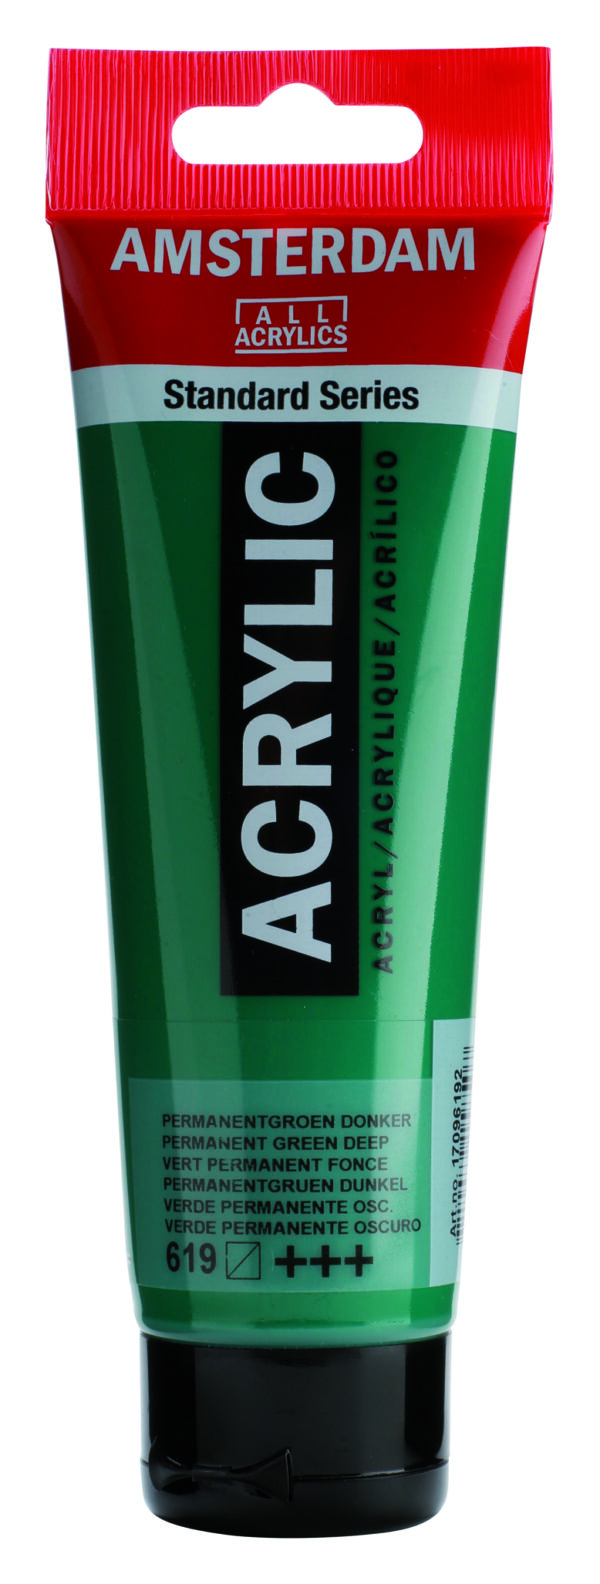 Ams std 619 Permanent green Deep - 120 ml